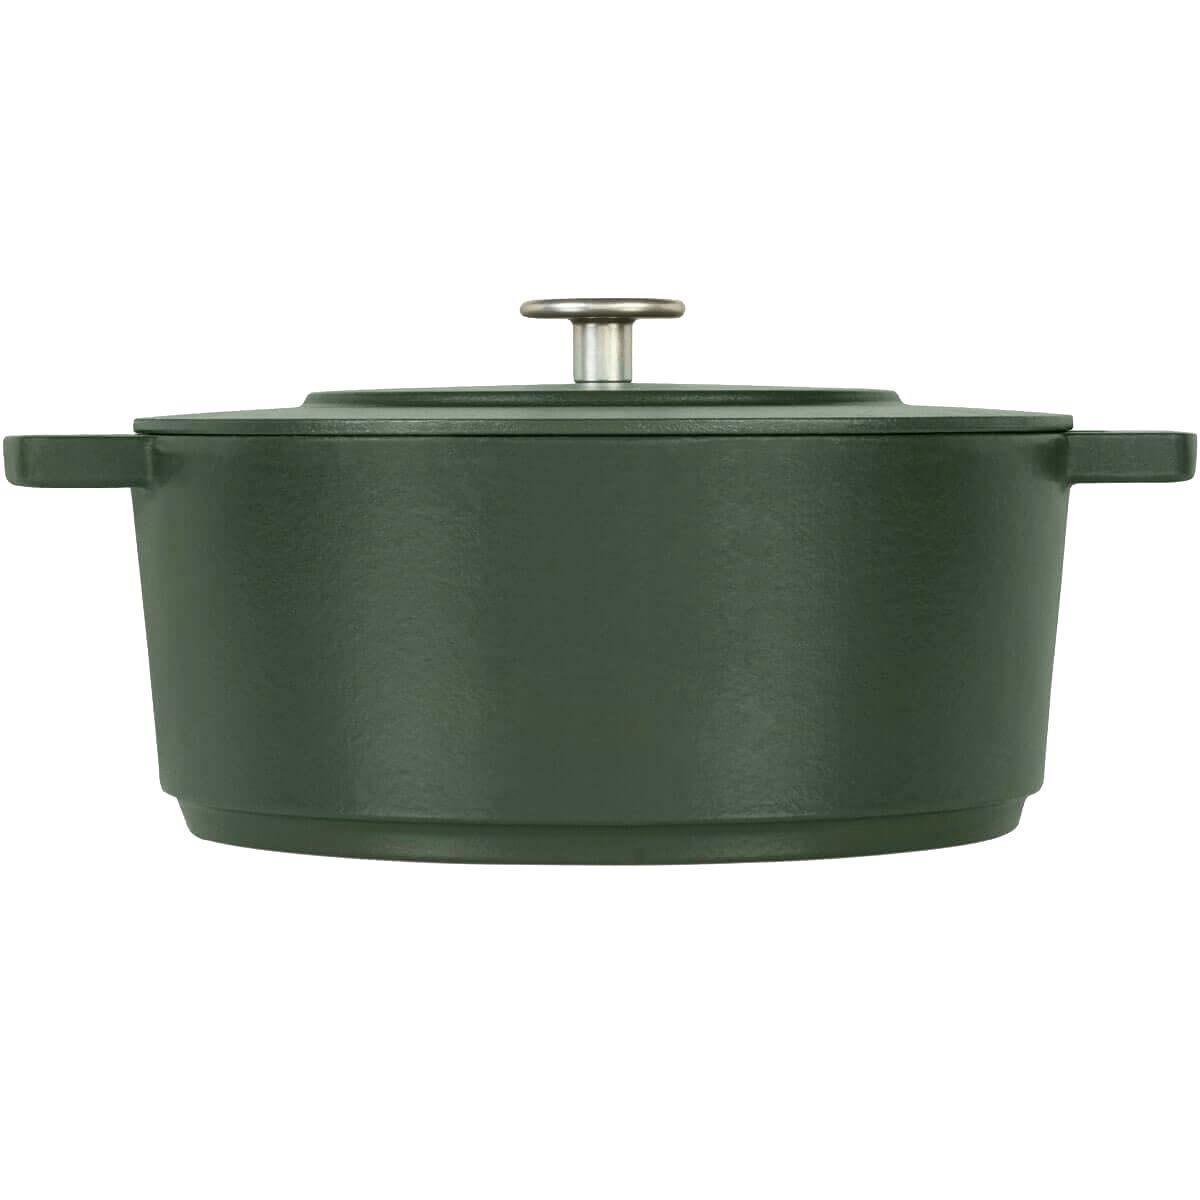 Dutch Oven Combekk-3